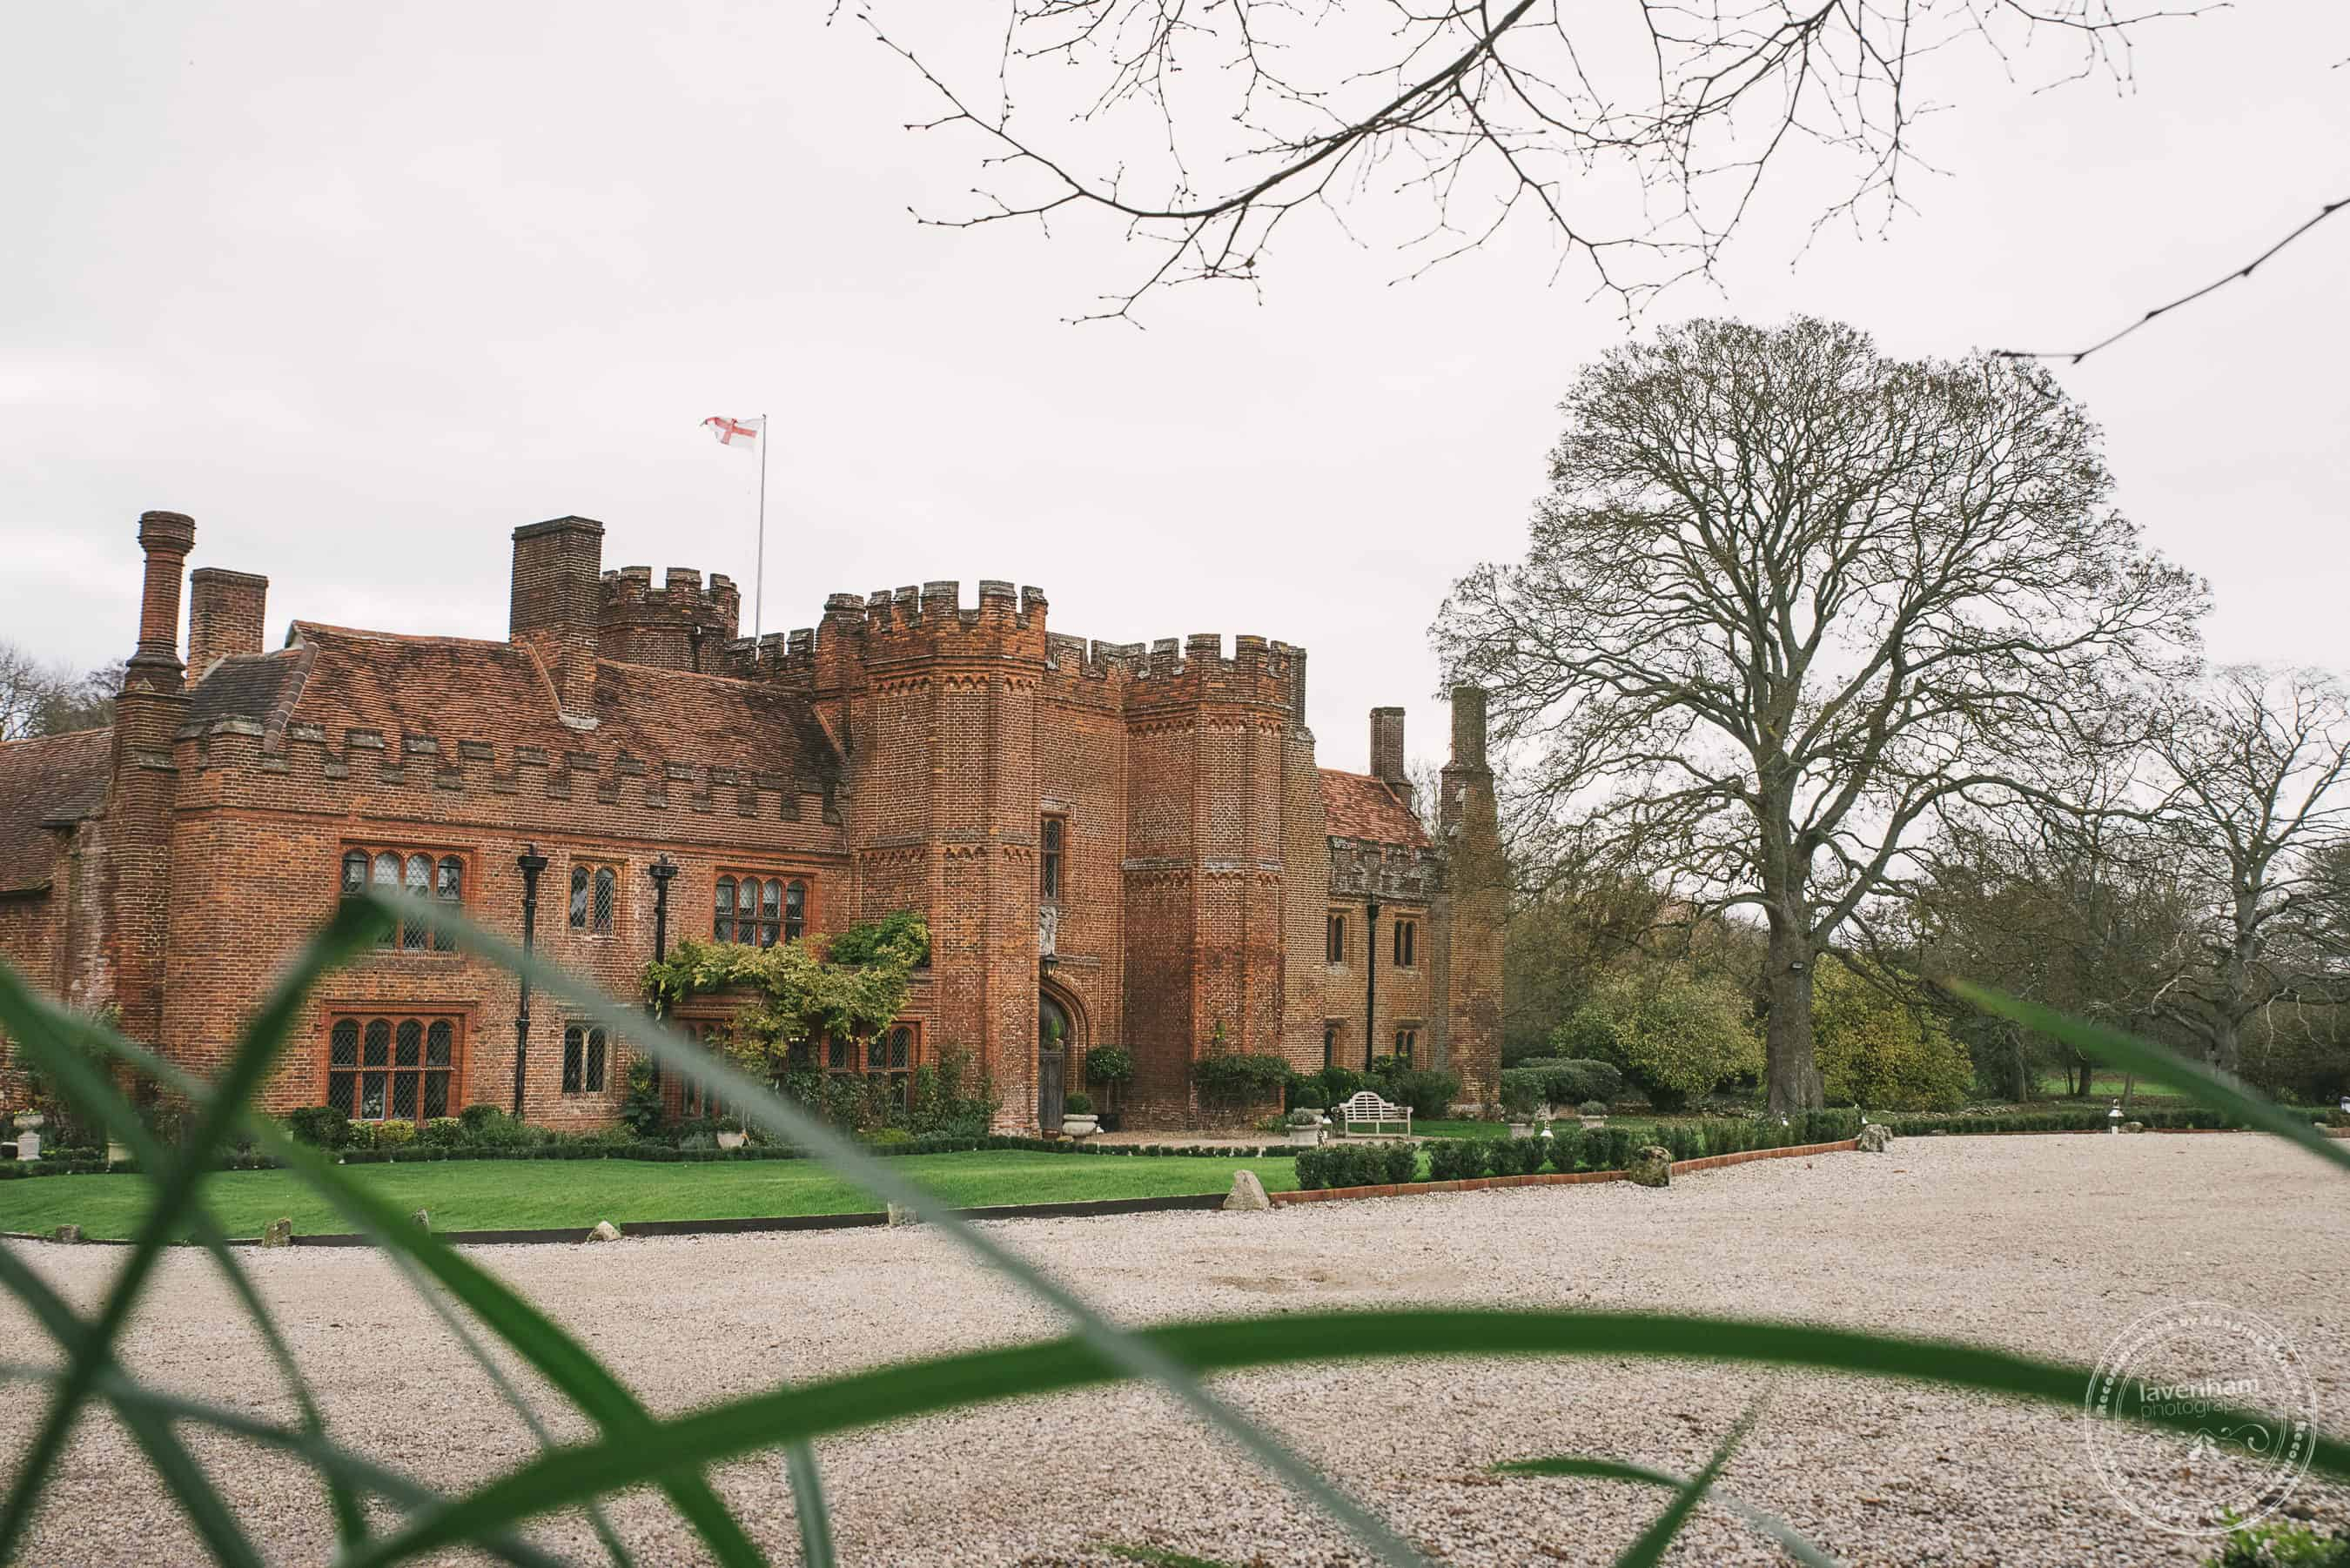 251118 Leez Priory Wedding Photography by Lavenham Photographic 001